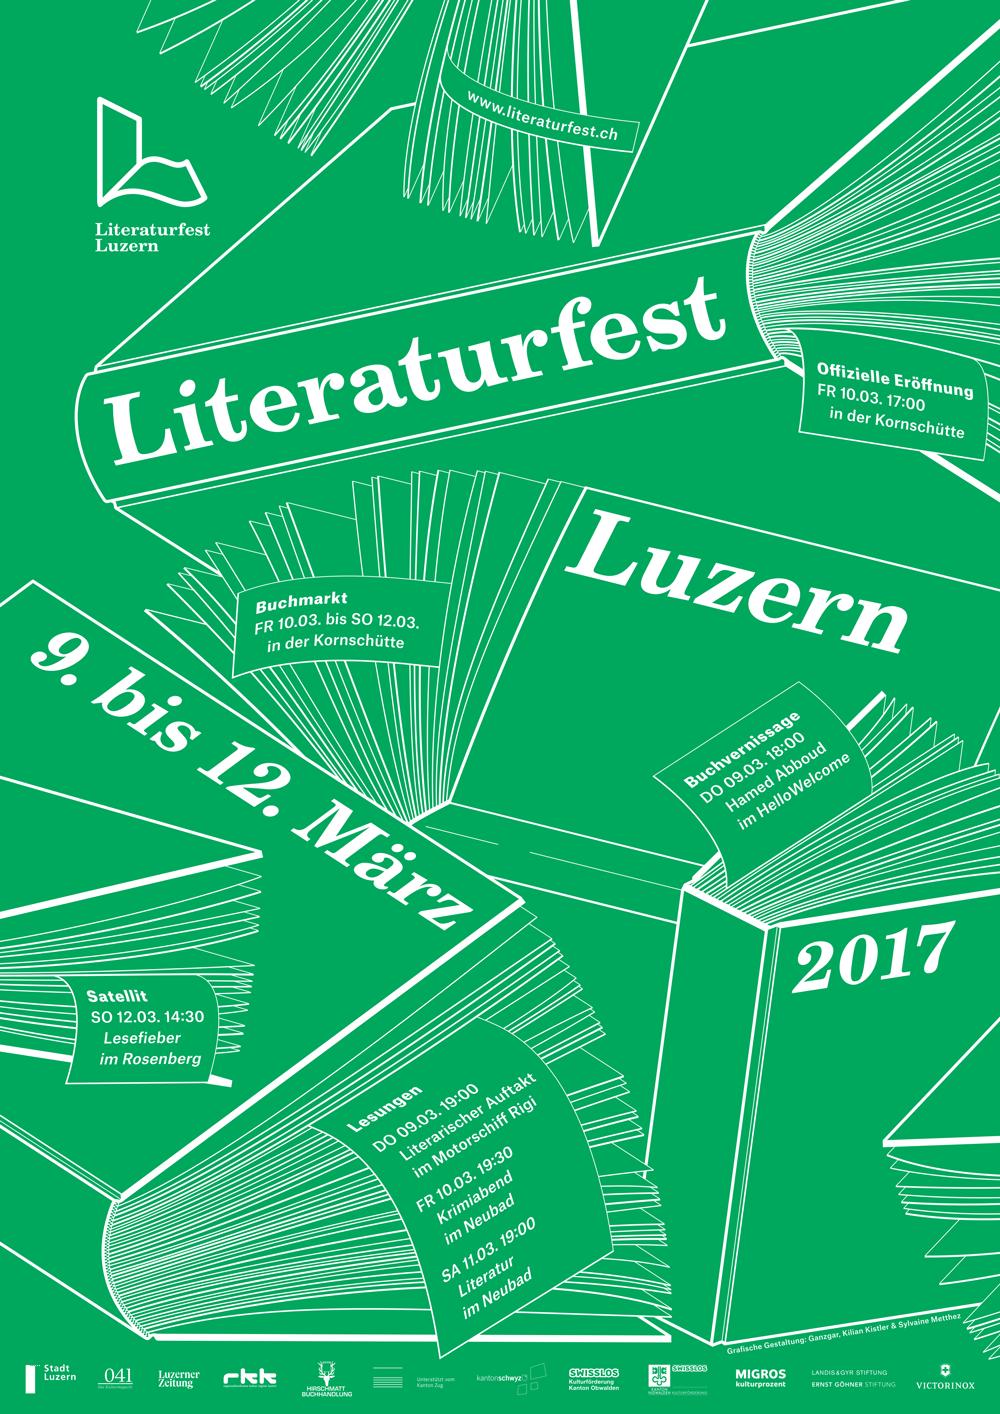 Literaturfest_Luzern_2017_Plakat_3